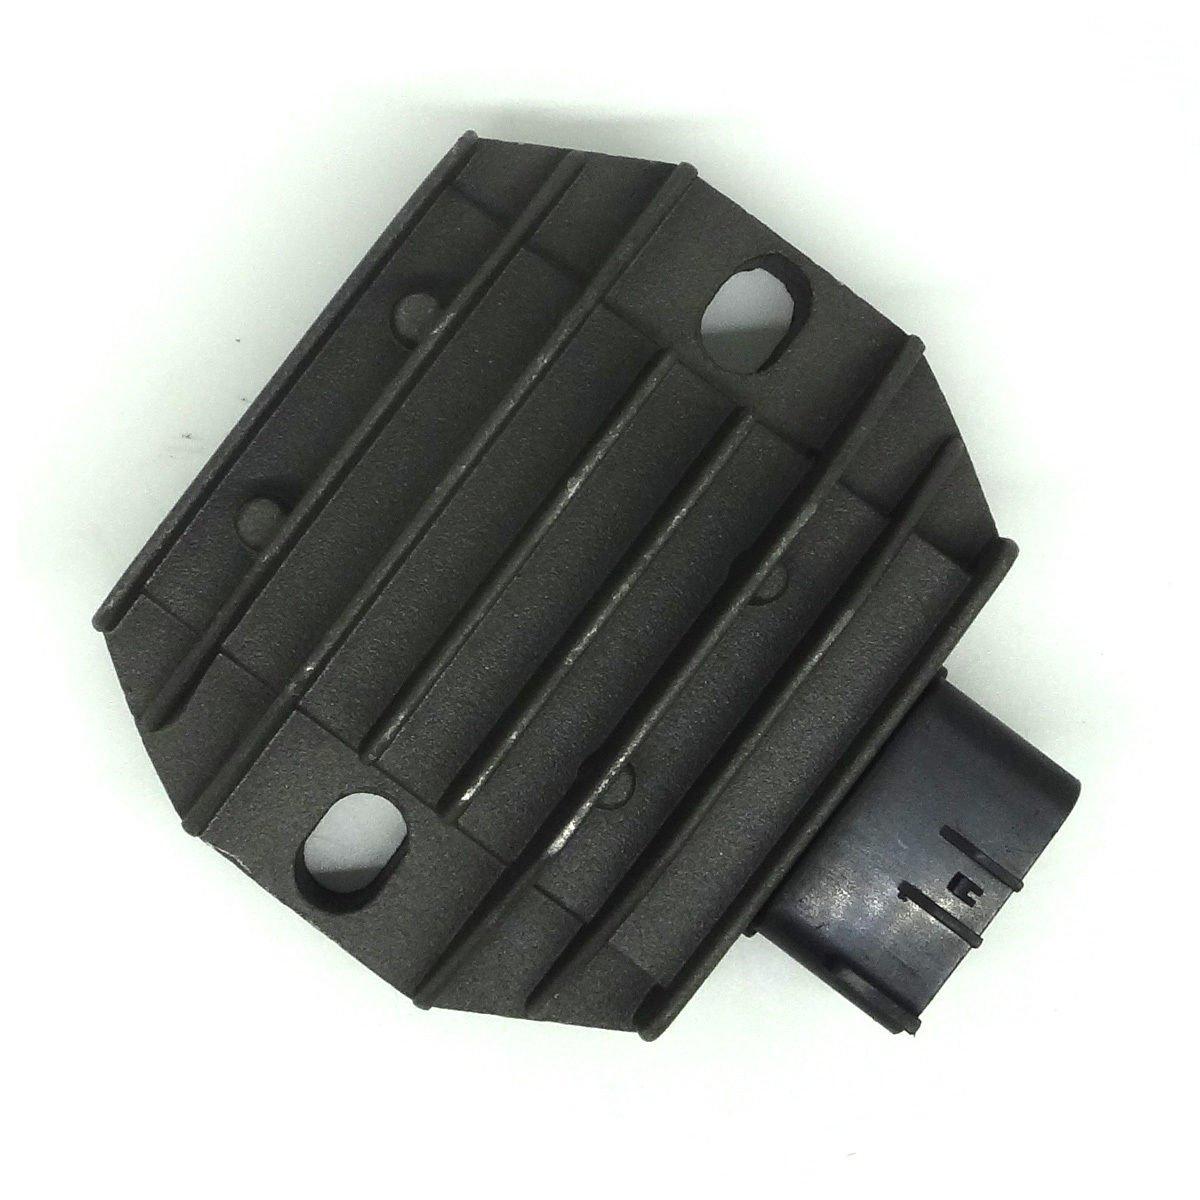 4X4 2000-2006 Conpus Regulator Rectifier fit Yamaha SH640D-12 SH640E-11 31600-HM8-013 Yamaha Kodiak 400 YFM4A 2X4